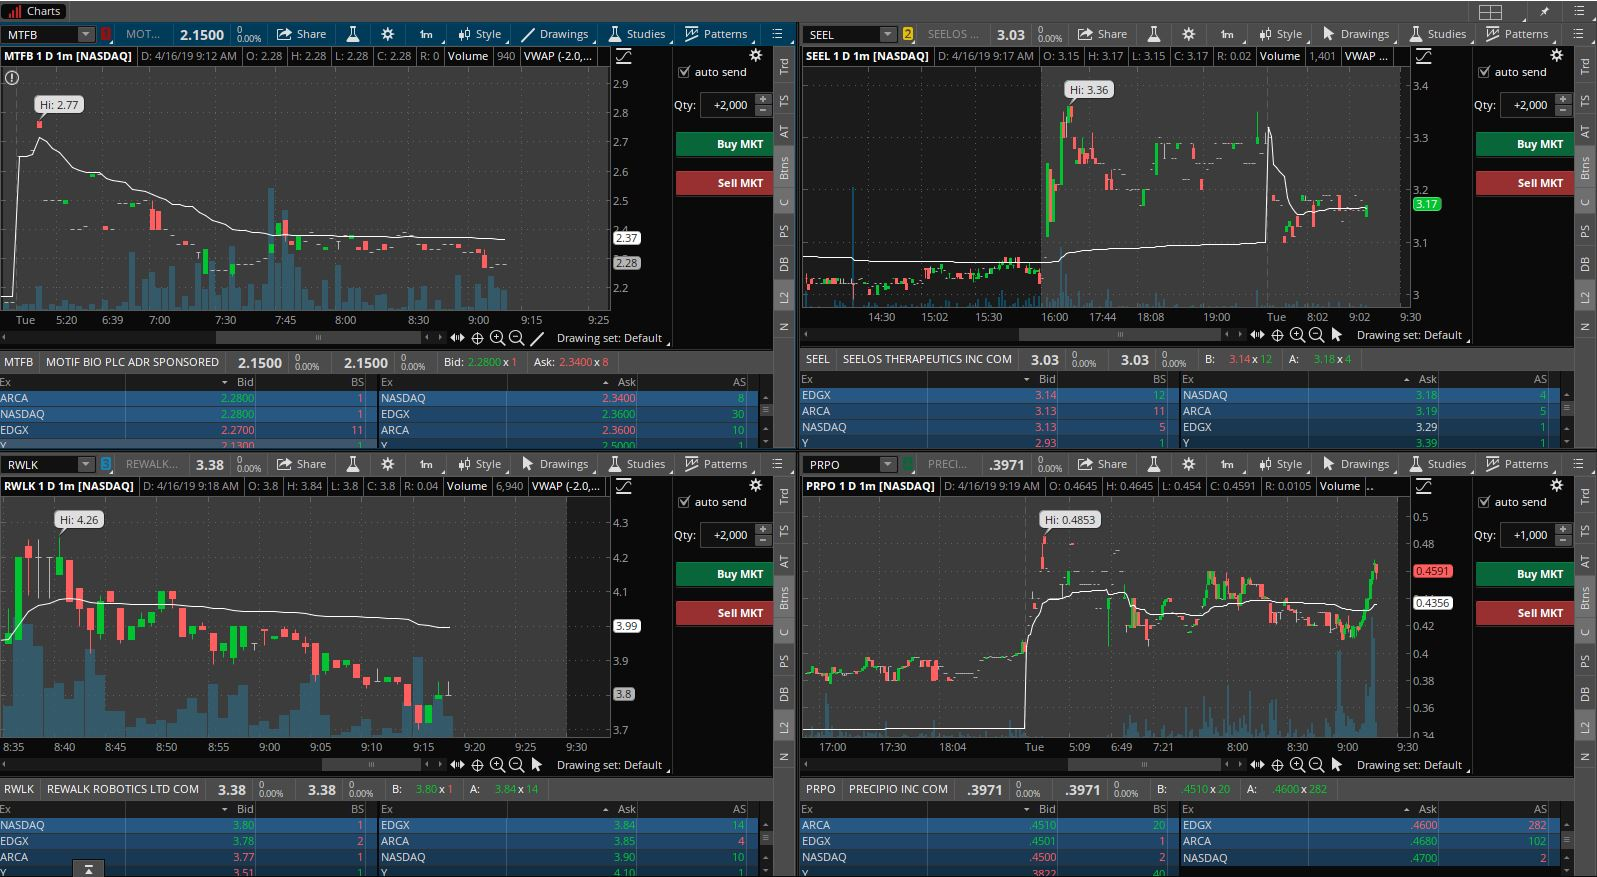 rwlk premarket trading